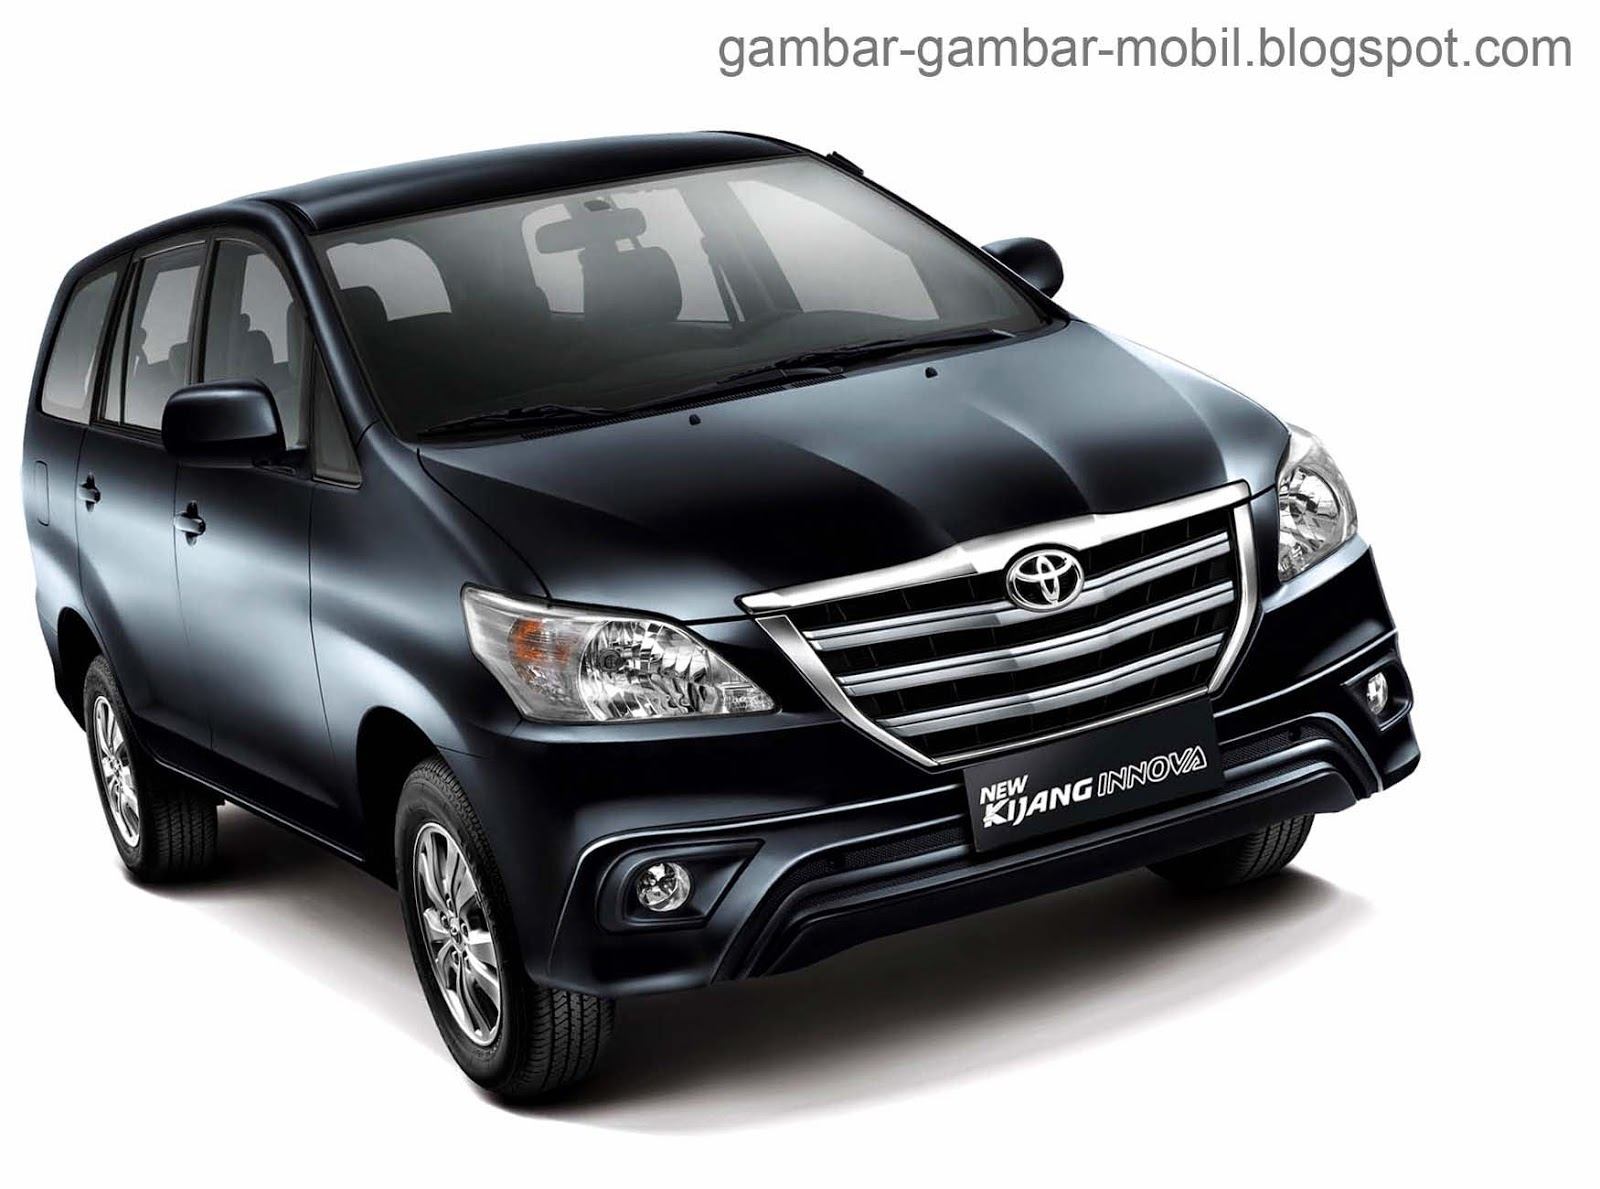 Foto Mobil All New Kijang Innova Toyota Yaris Trd Sportivo Philippines Gambar Baru